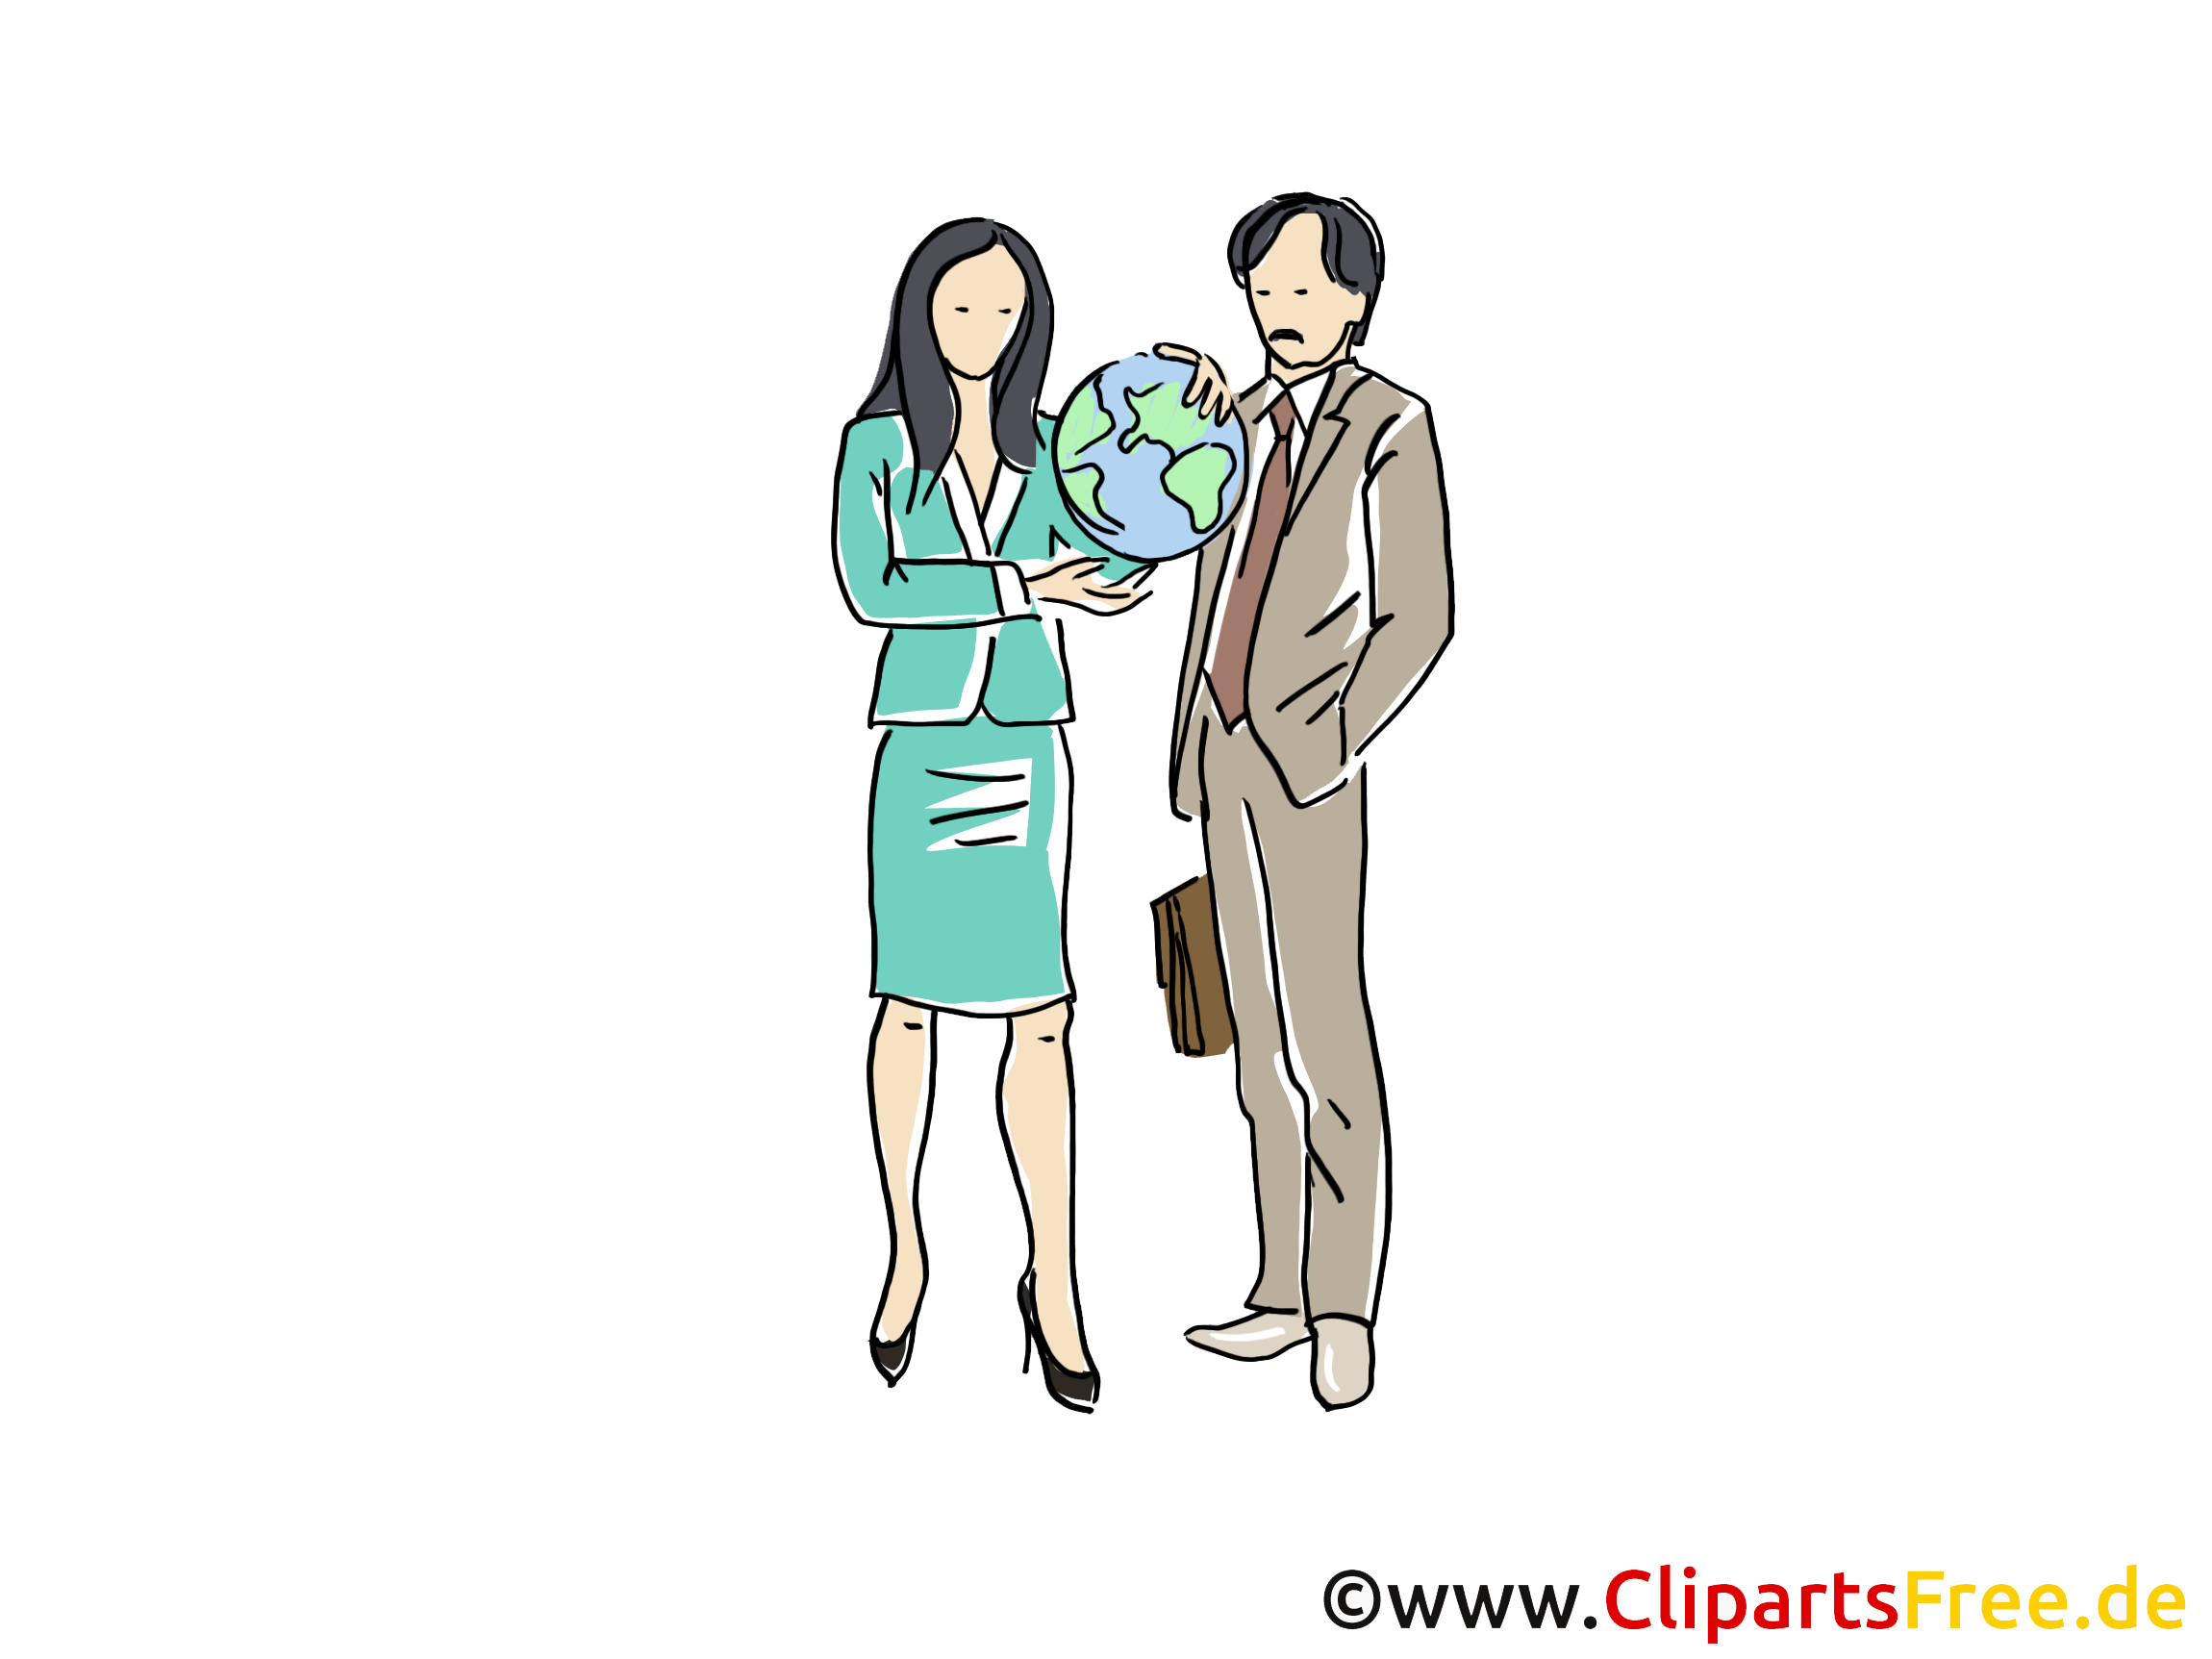 Reisebüro Clipart, Grafik, Bild, Cartoon